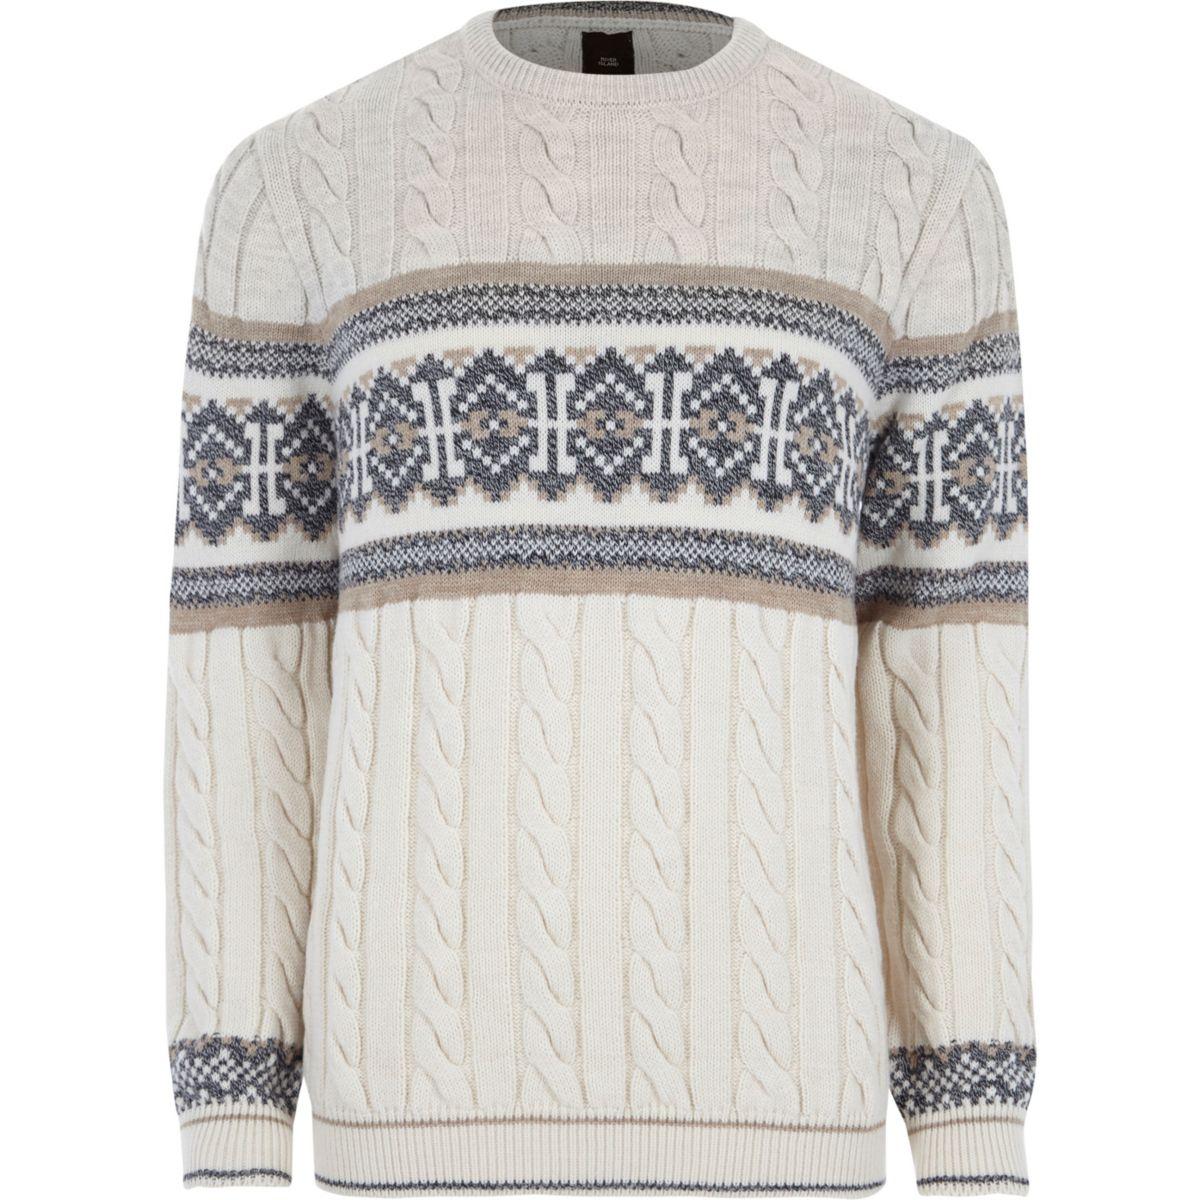 Stone Fairisle cable knit Christmas jumper